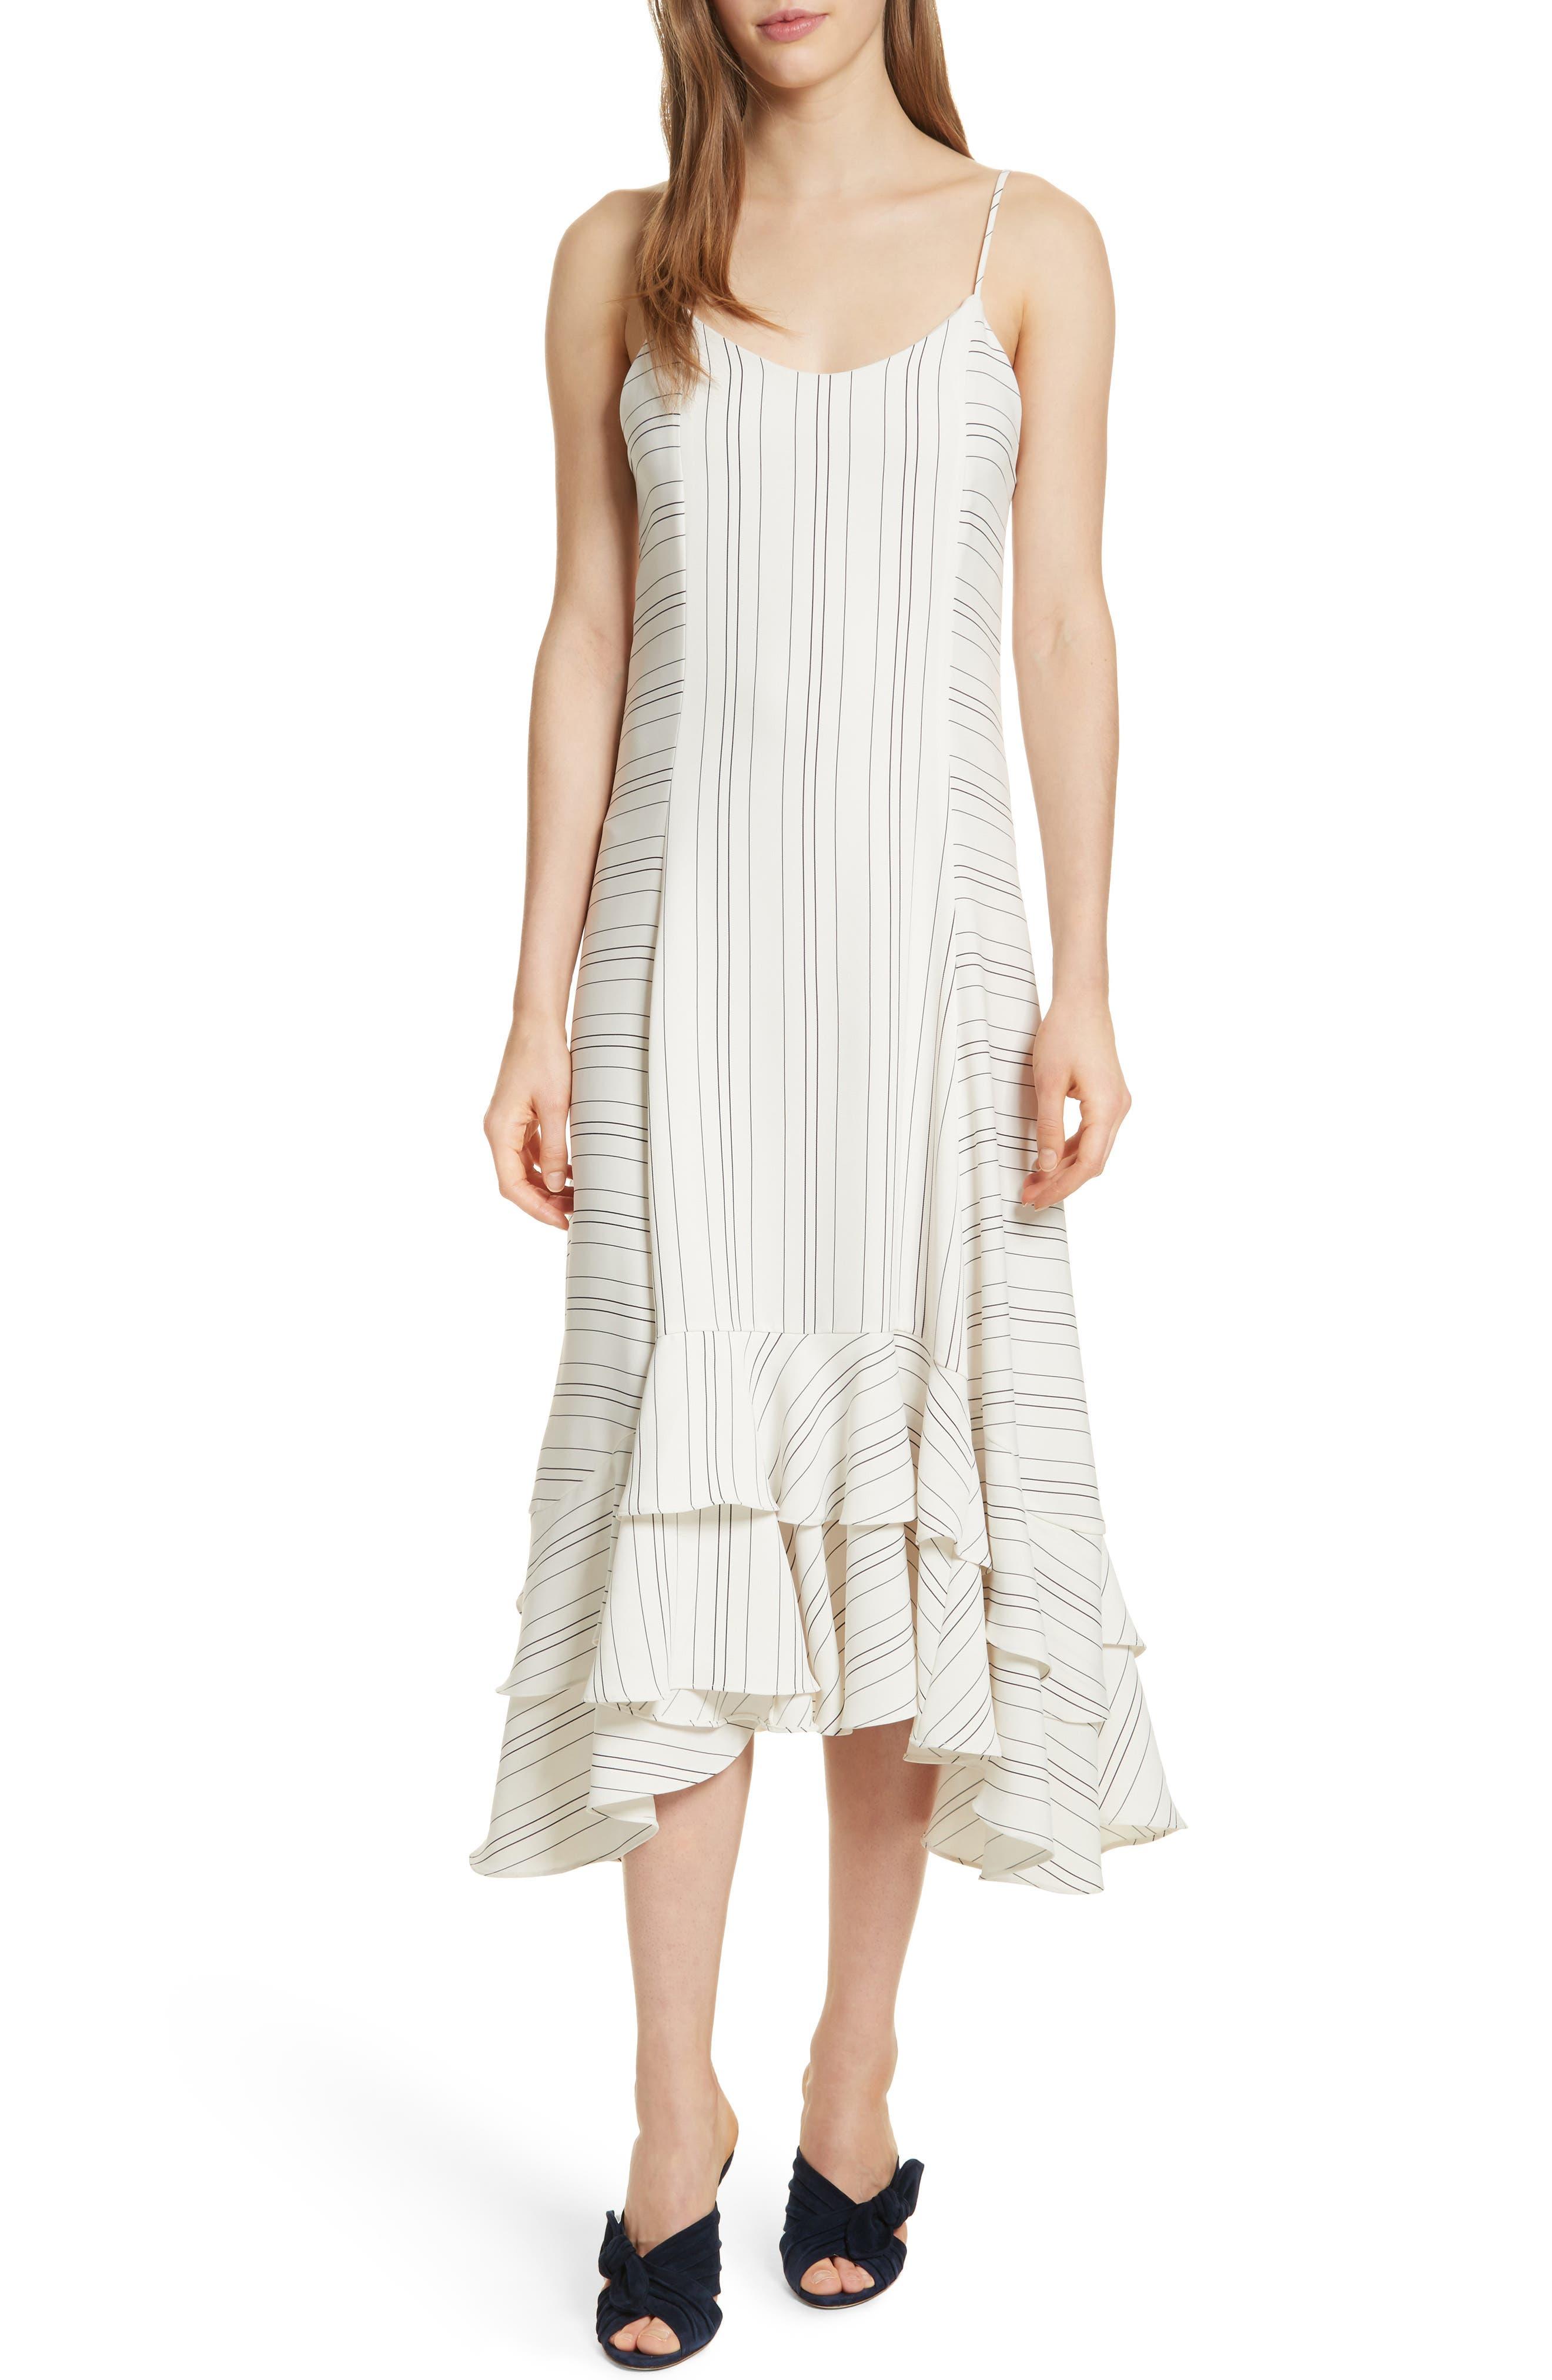 Prose & Poetry Skylar Flare Midi Dress,                         Main,                         color, Light Ecru